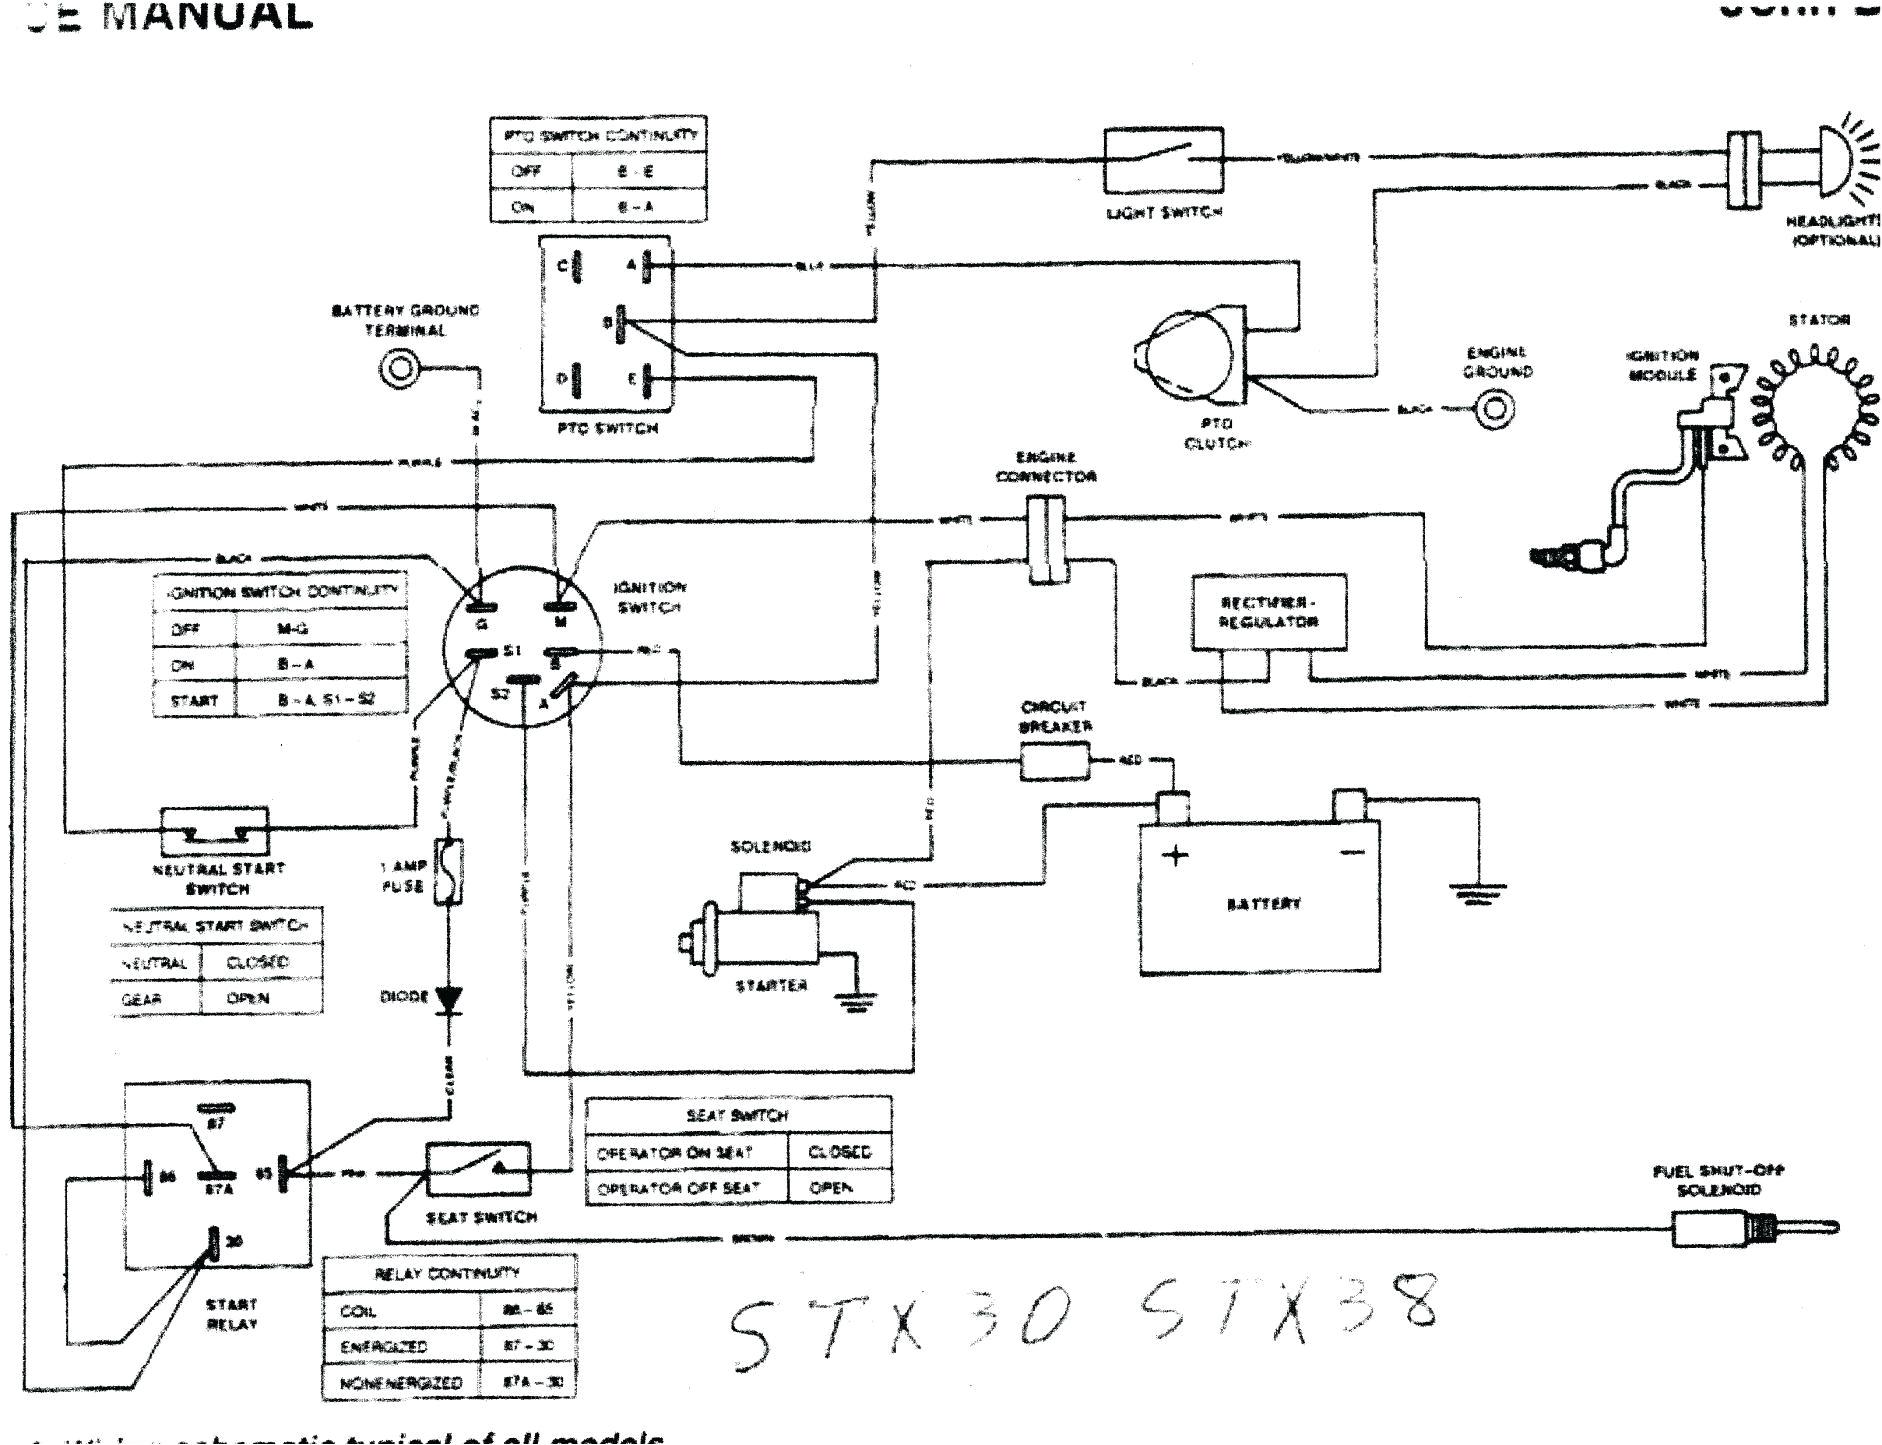 john deere 450c wiring harness wiring diagrams ments john deere 450c wiring harness wire management